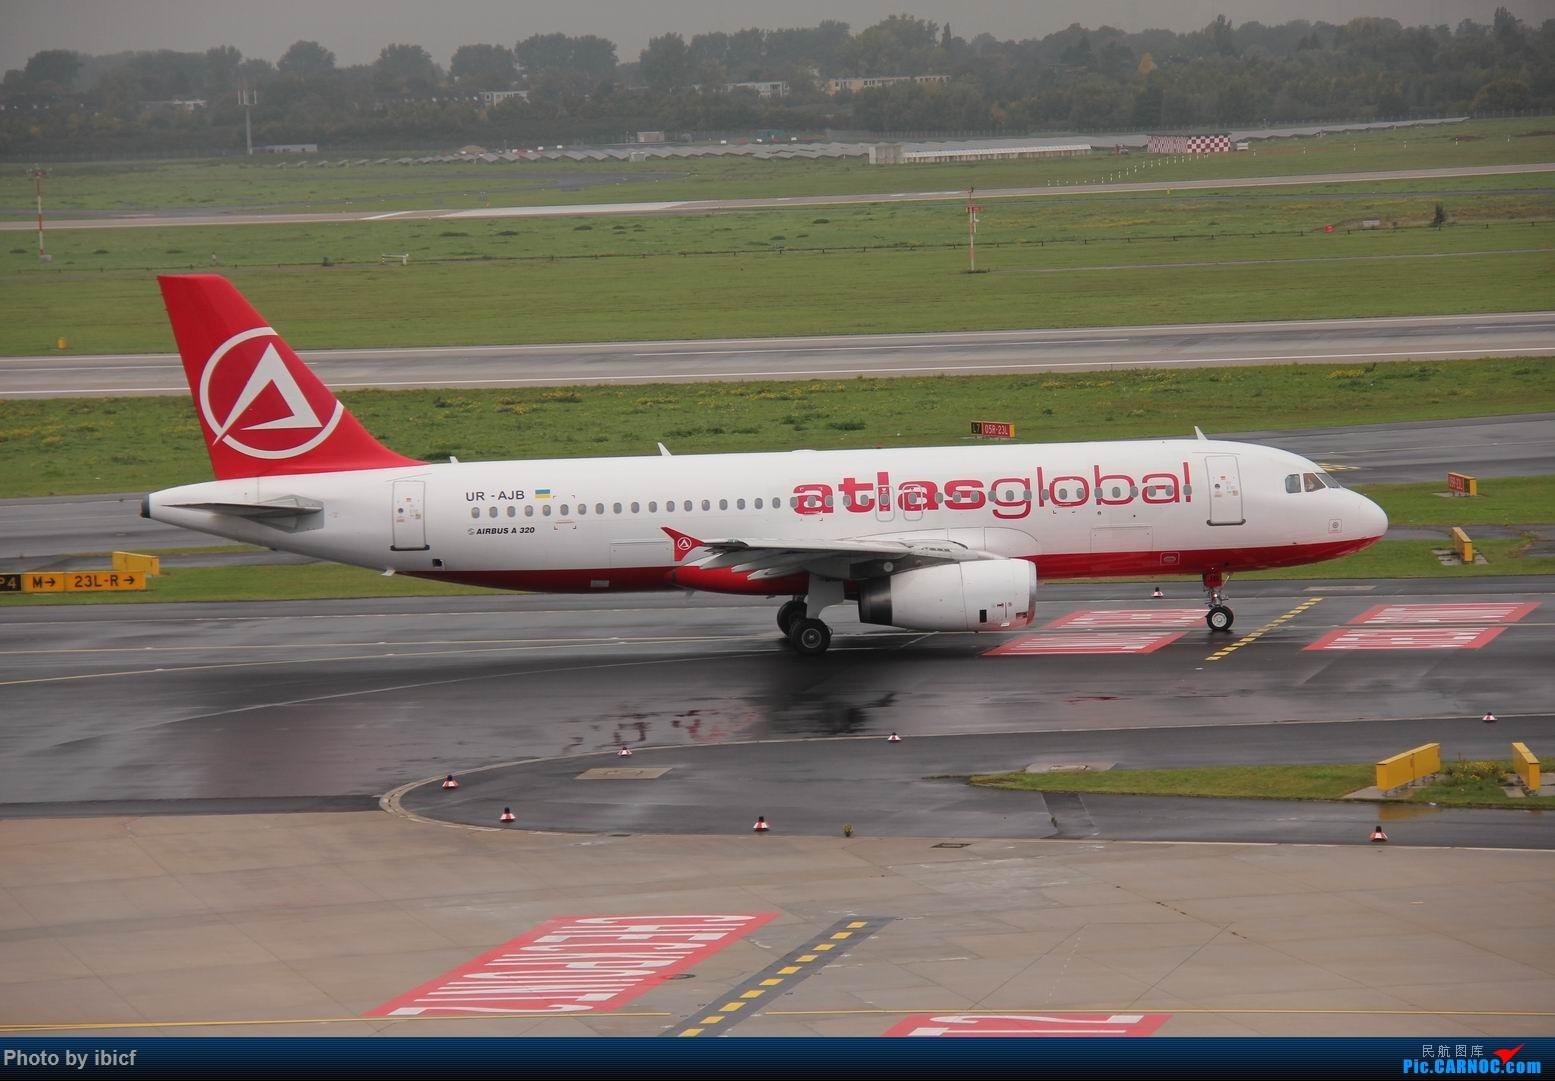 Re:[原创]国庆杜塞拍机 AIRBUS A320-200 UR-AJB DUS